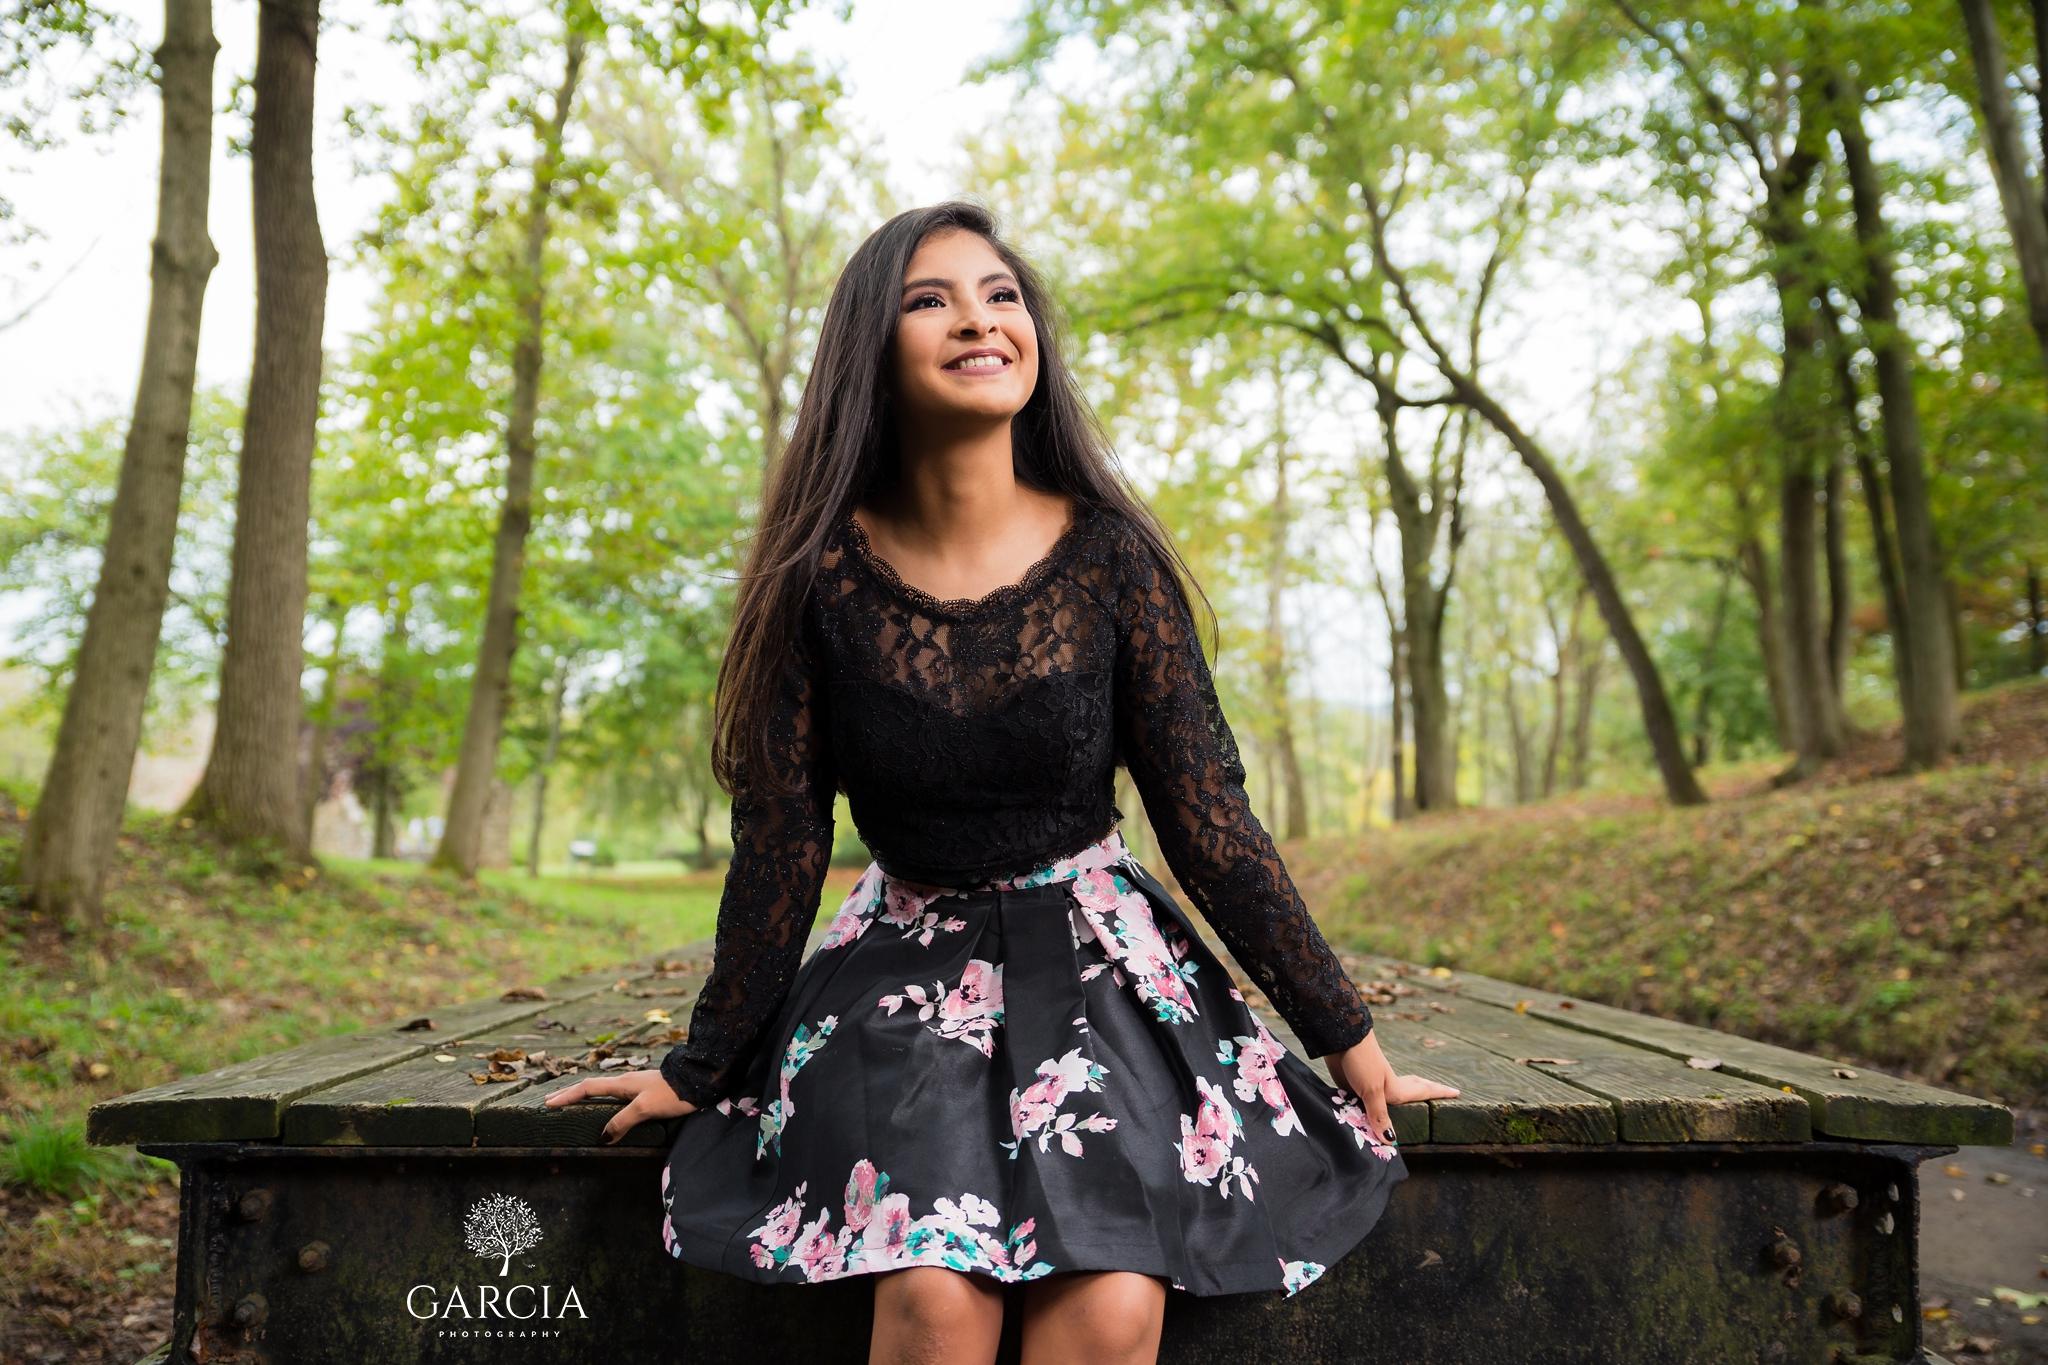 Genesis-Quince-Portrait-Garcia-Photography-4706.jpg